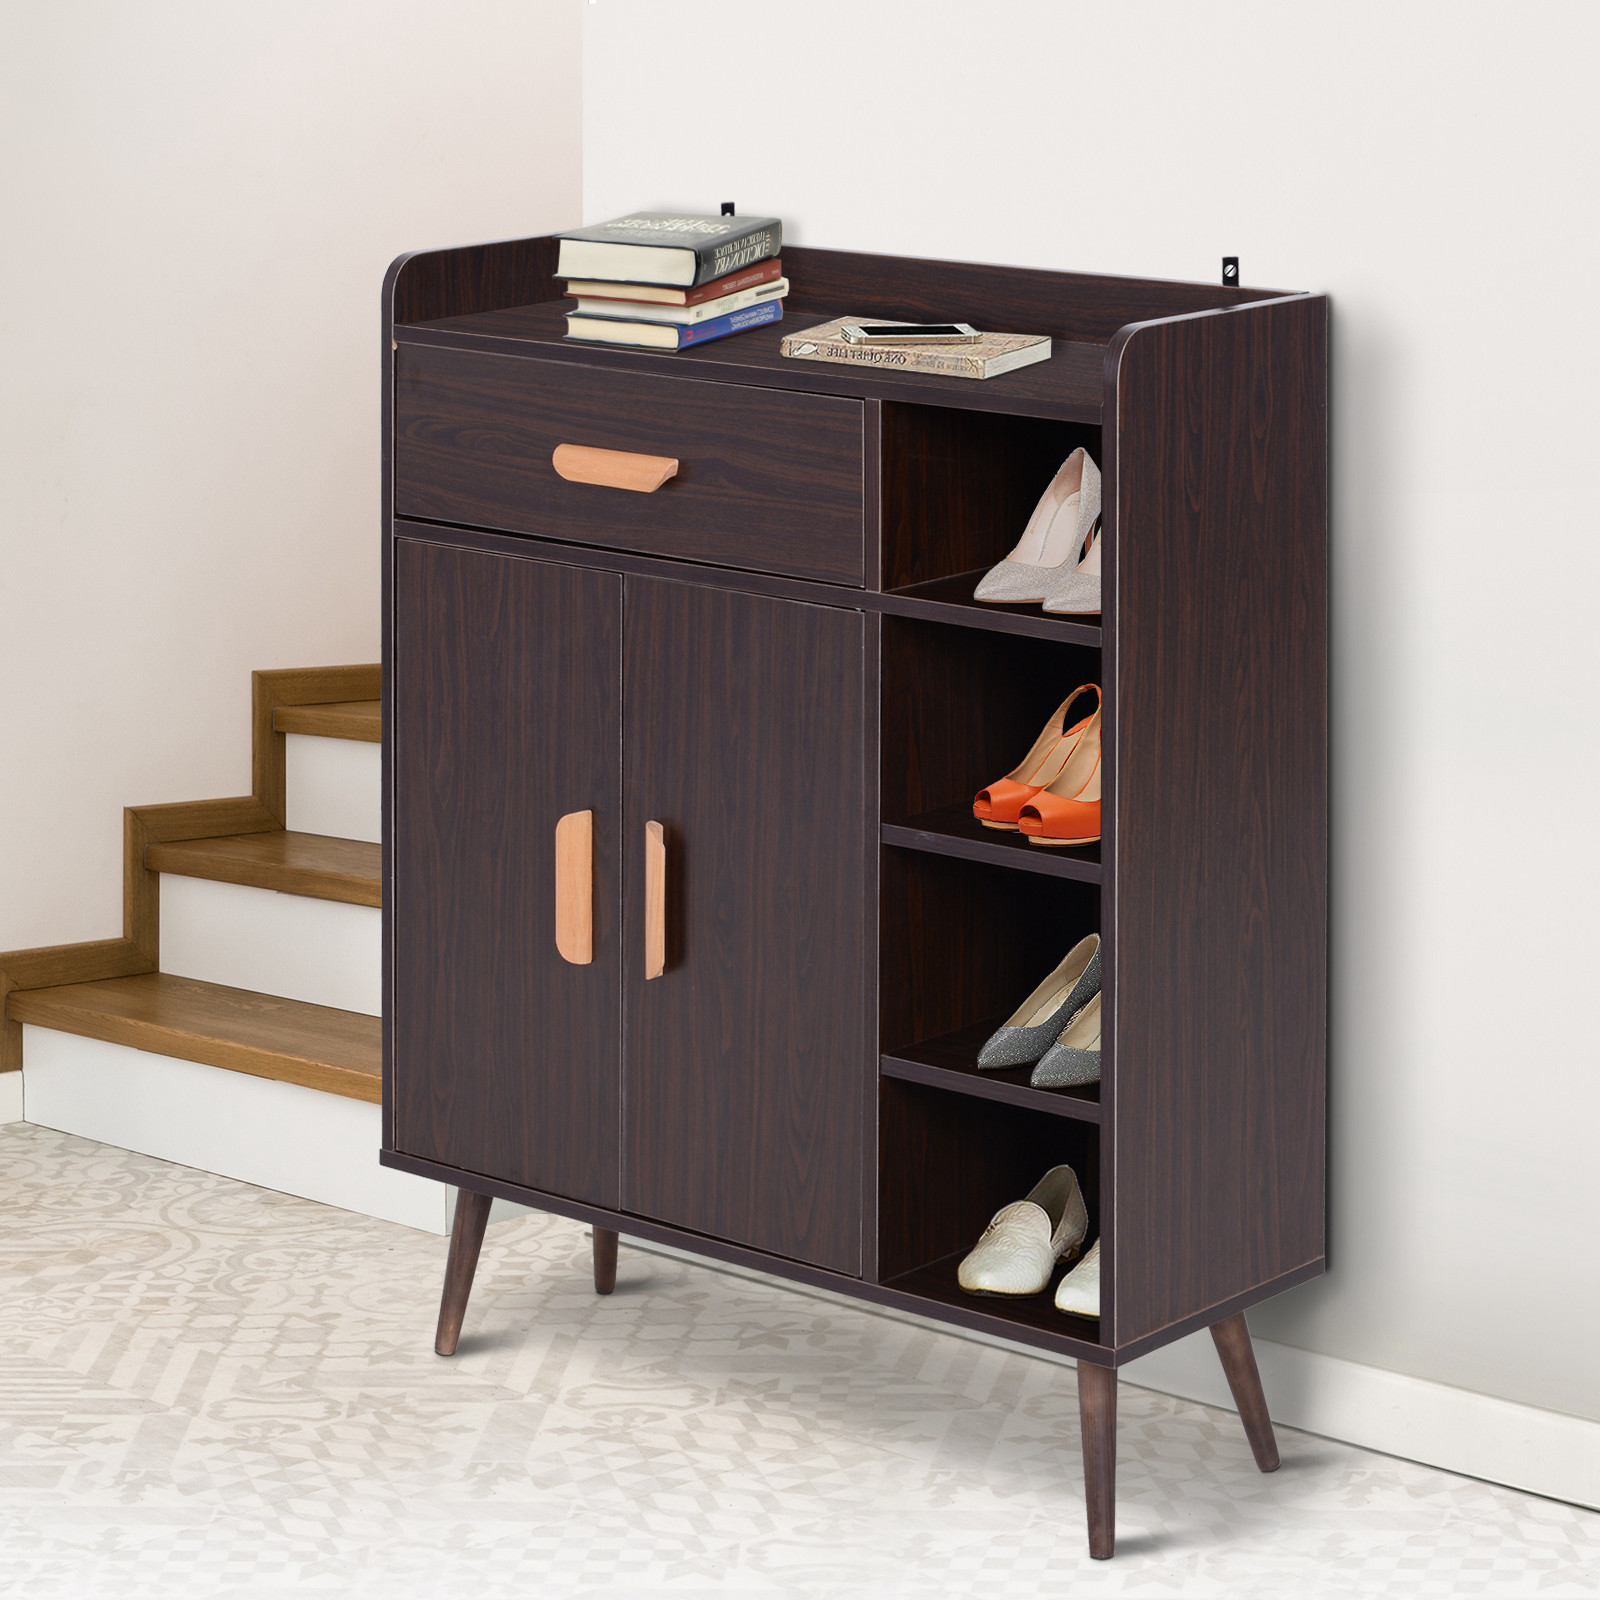 thumbnail 7 - Side-Cabinet-Hallway-Storage-Unit-Console-Table-Entrance-Shelf-Cupboard-2-color